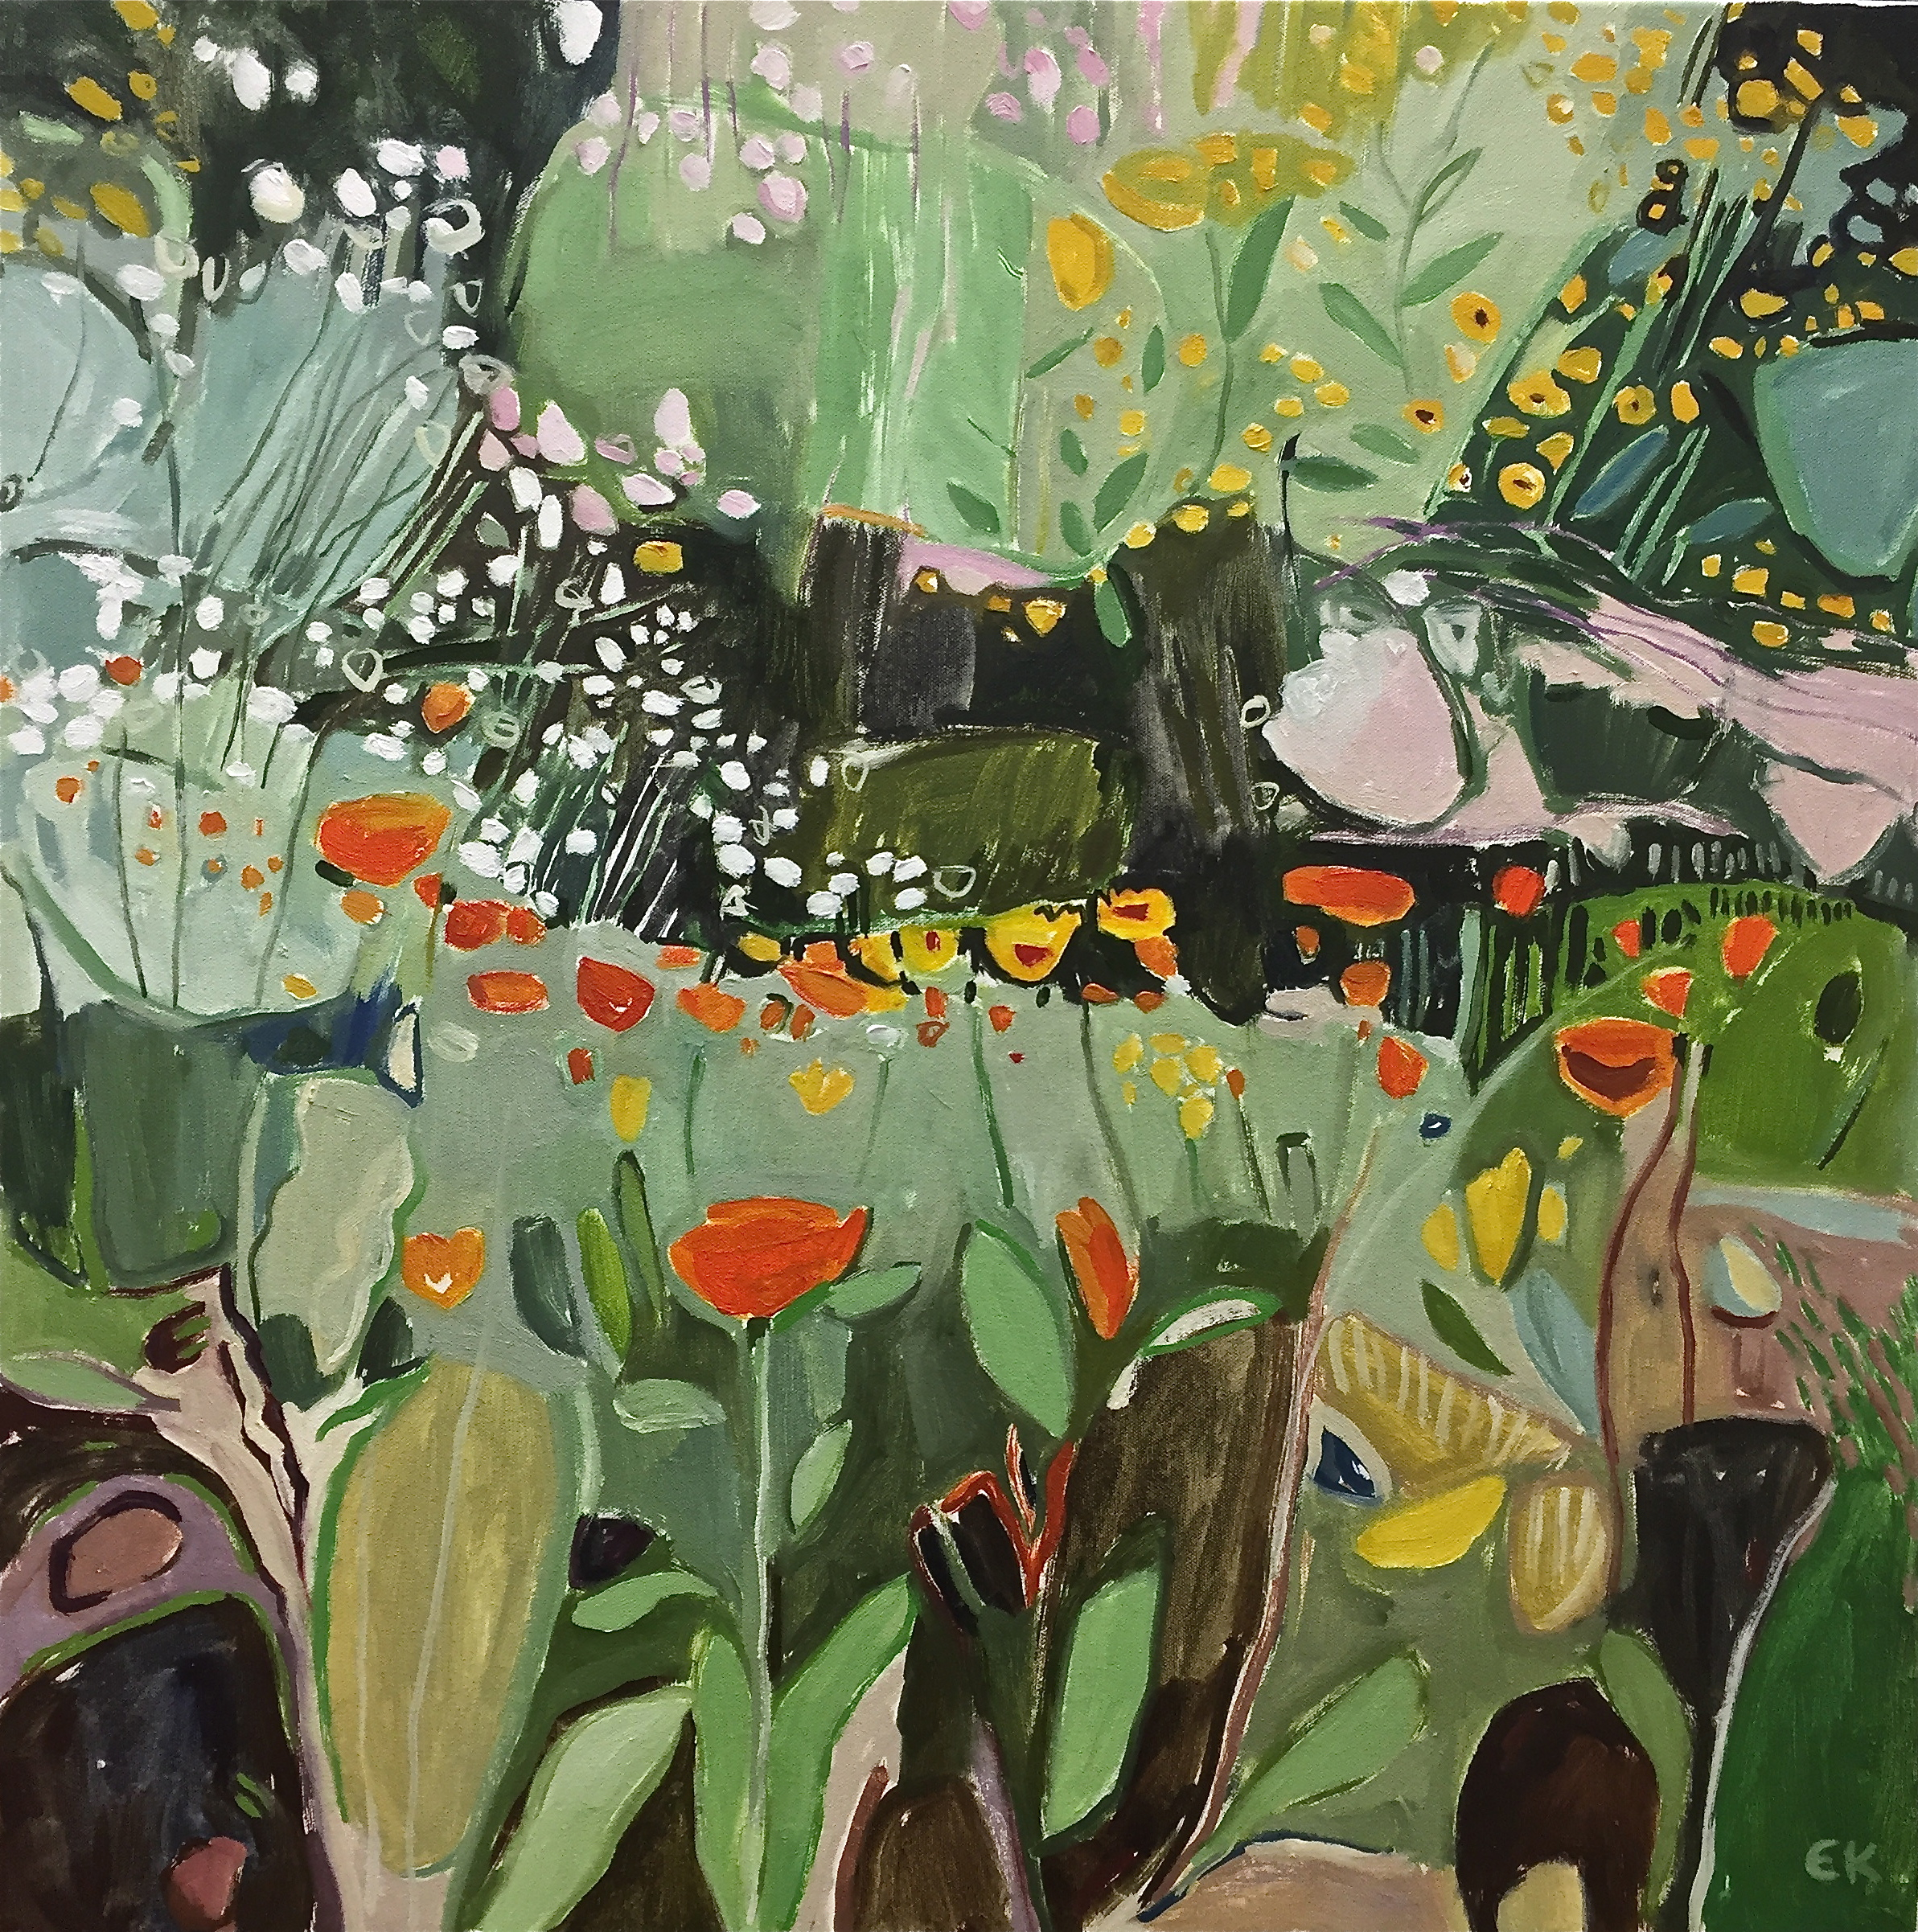 Marigolds and Ox-Eye Dasies, Oxford Botanic Gardens